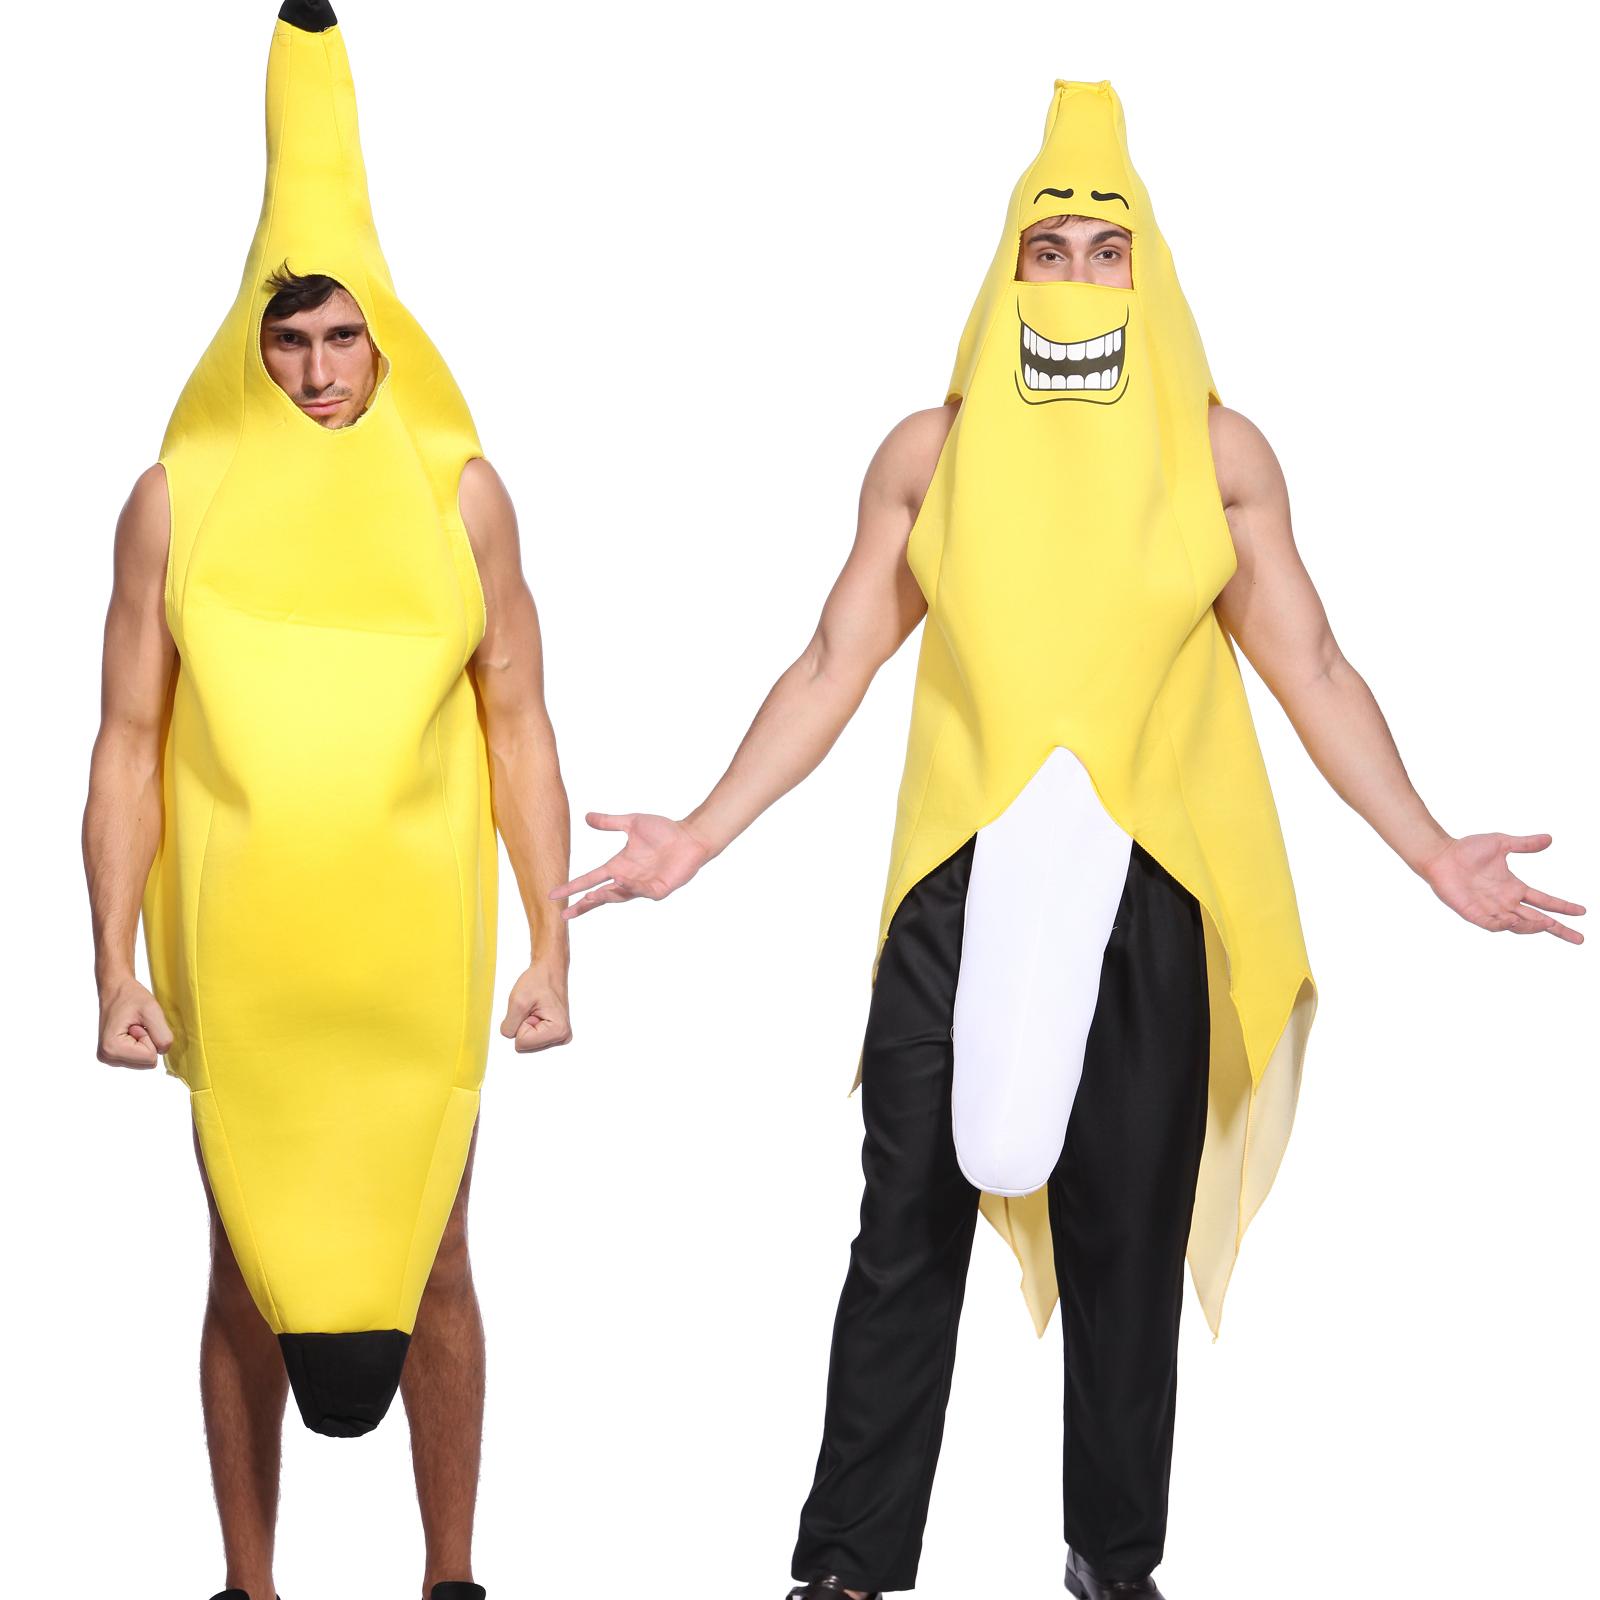 bananenanzug fasching verkleidung damen herren banane kost m gruppenkost m fancy ebay. Black Bedroom Furniture Sets. Home Design Ideas